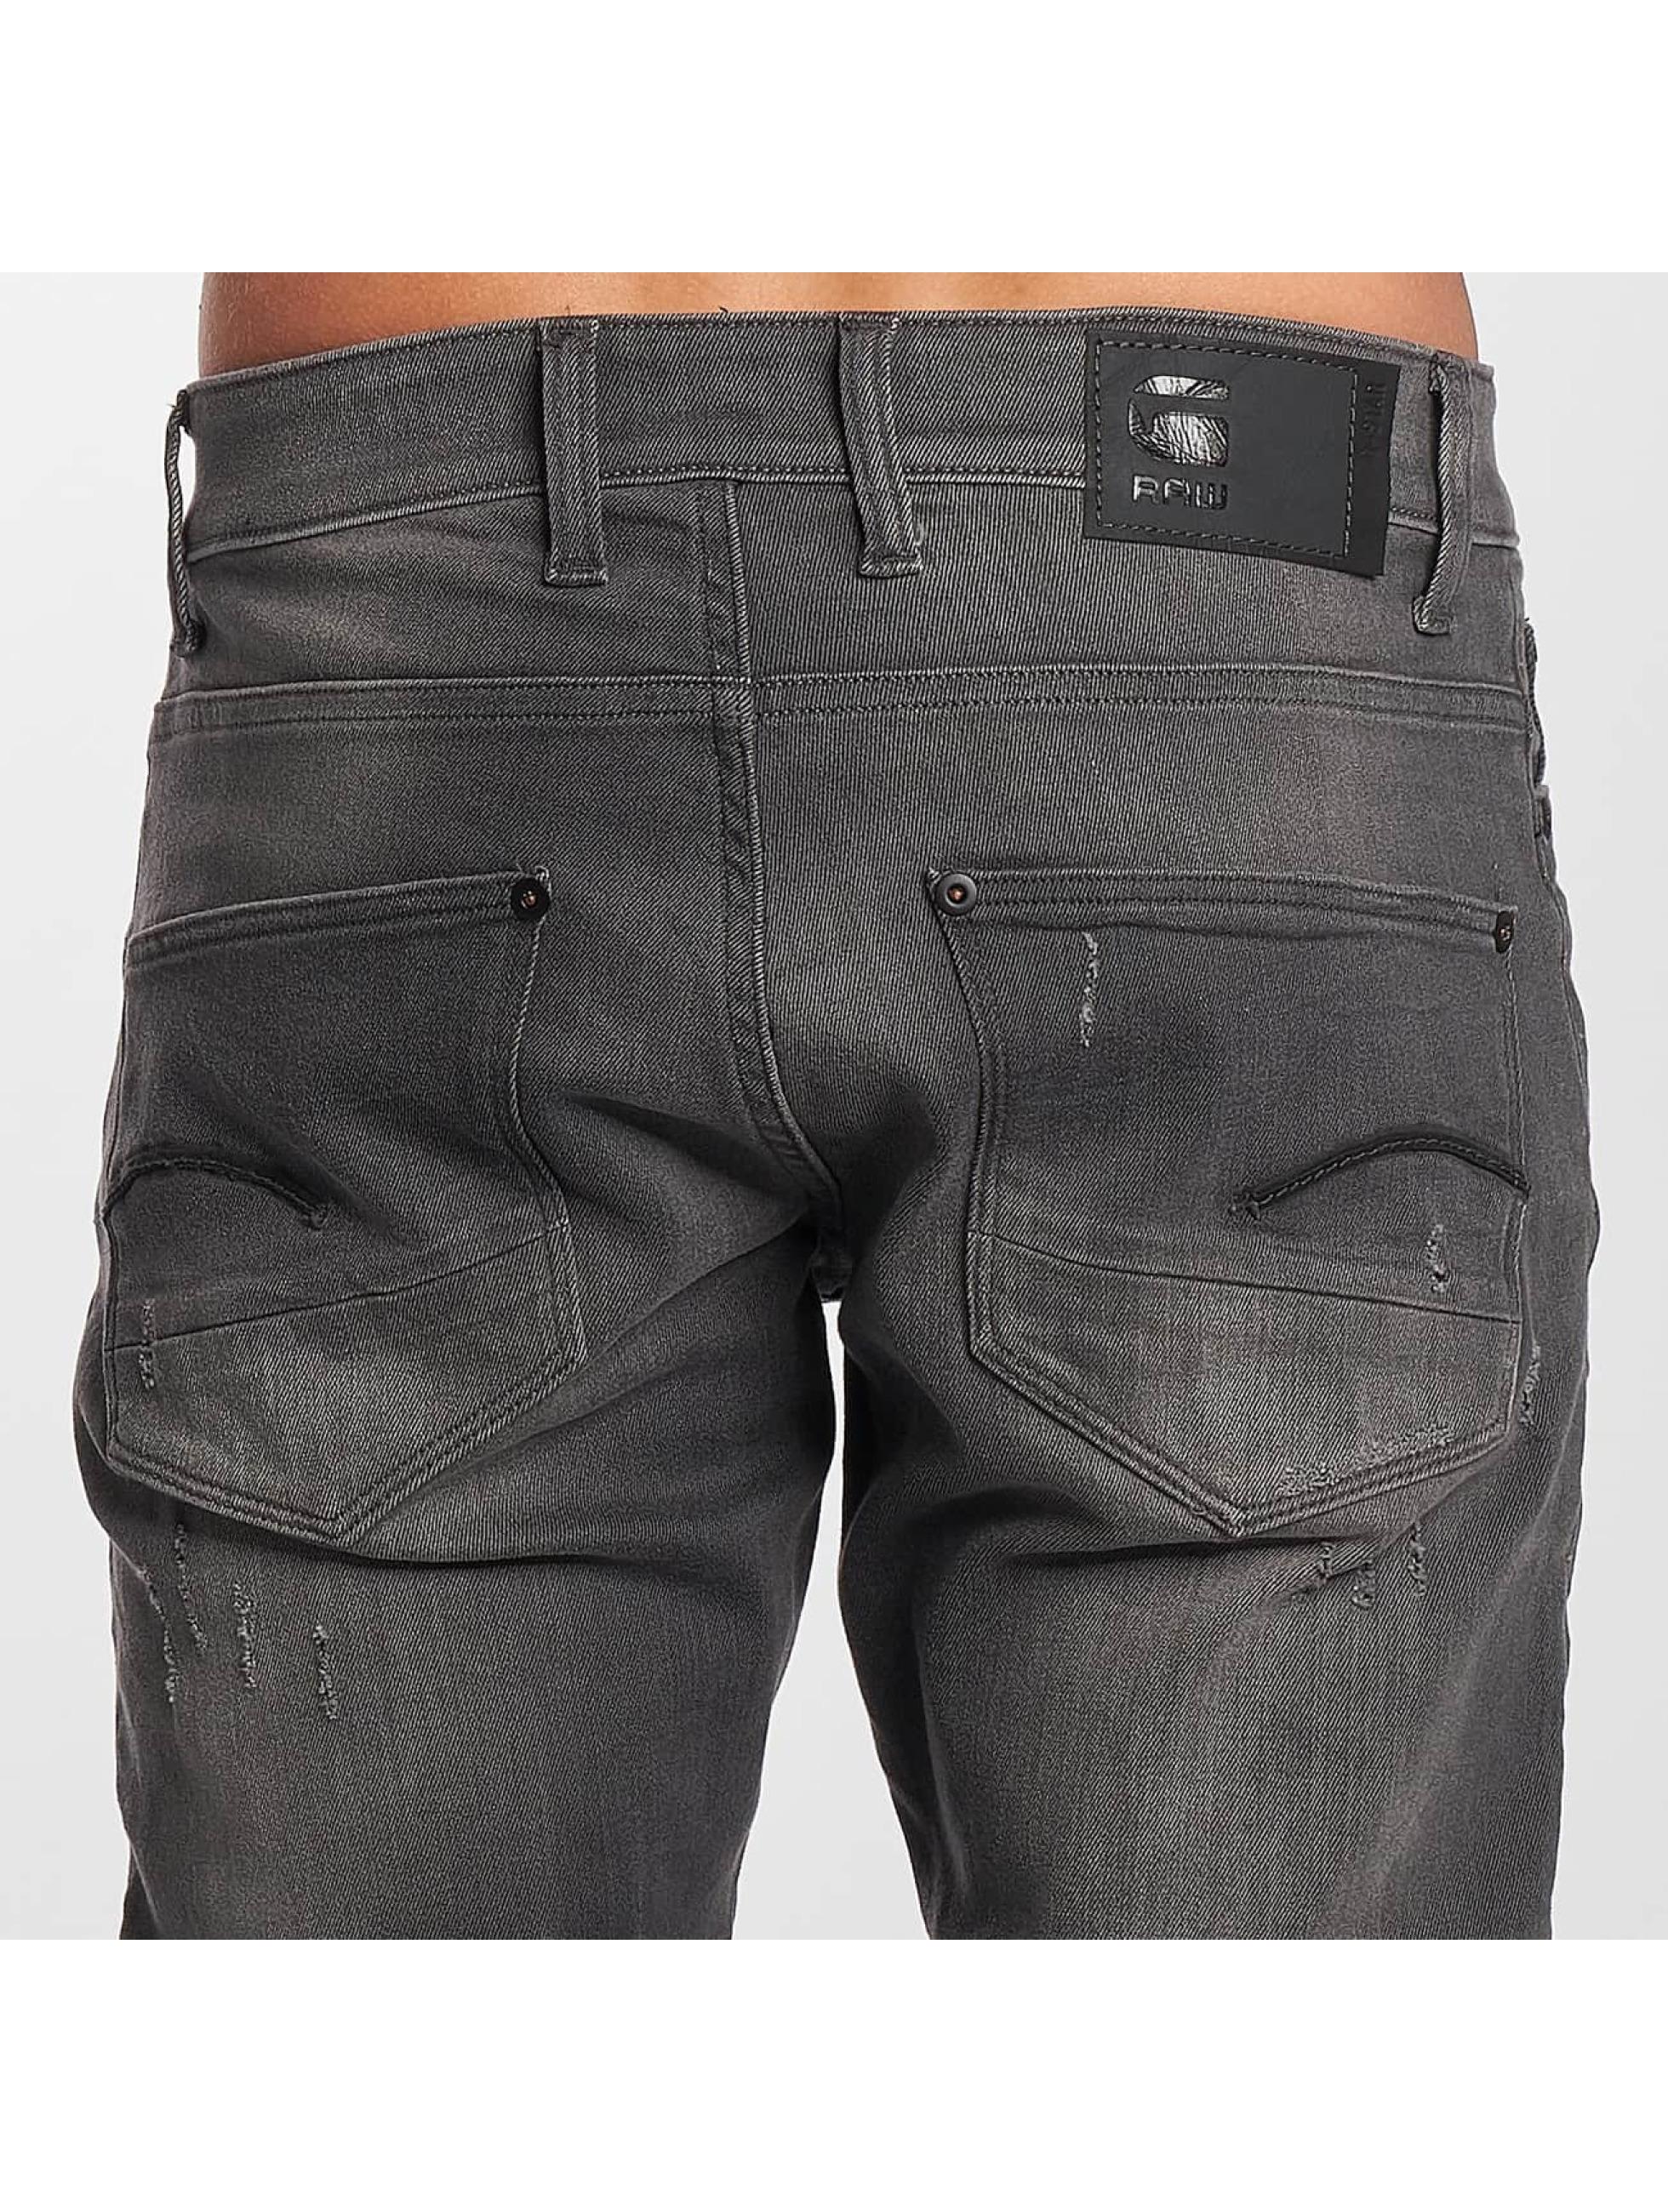 G-Star Slim Fit Jeans Revend Super grau